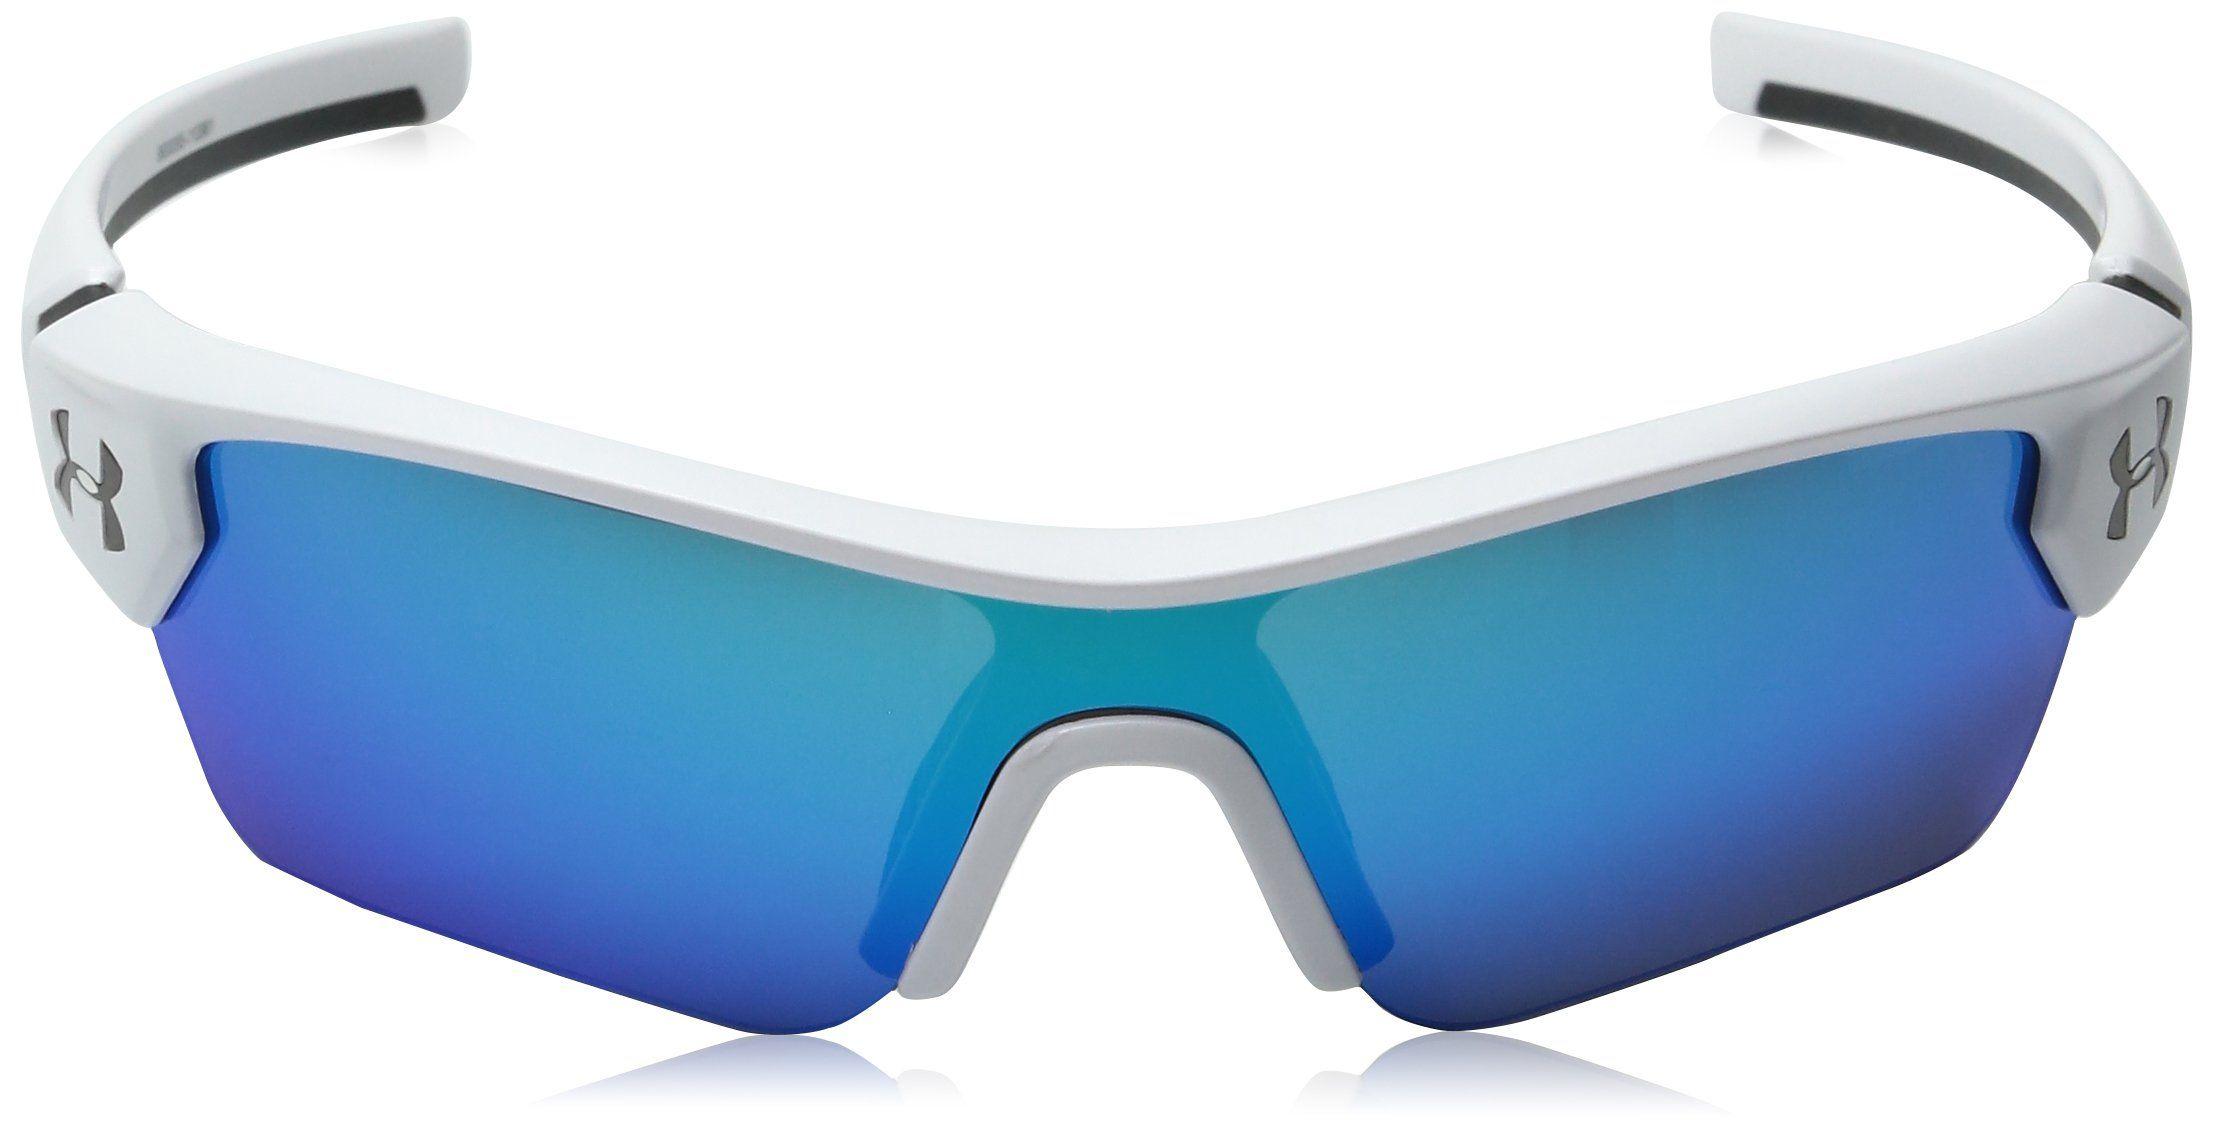 7c3331c1ef Under Armour UA Menace Wrap Sunglasses UA Menace Satin White   Charcoal  Frame   Gray